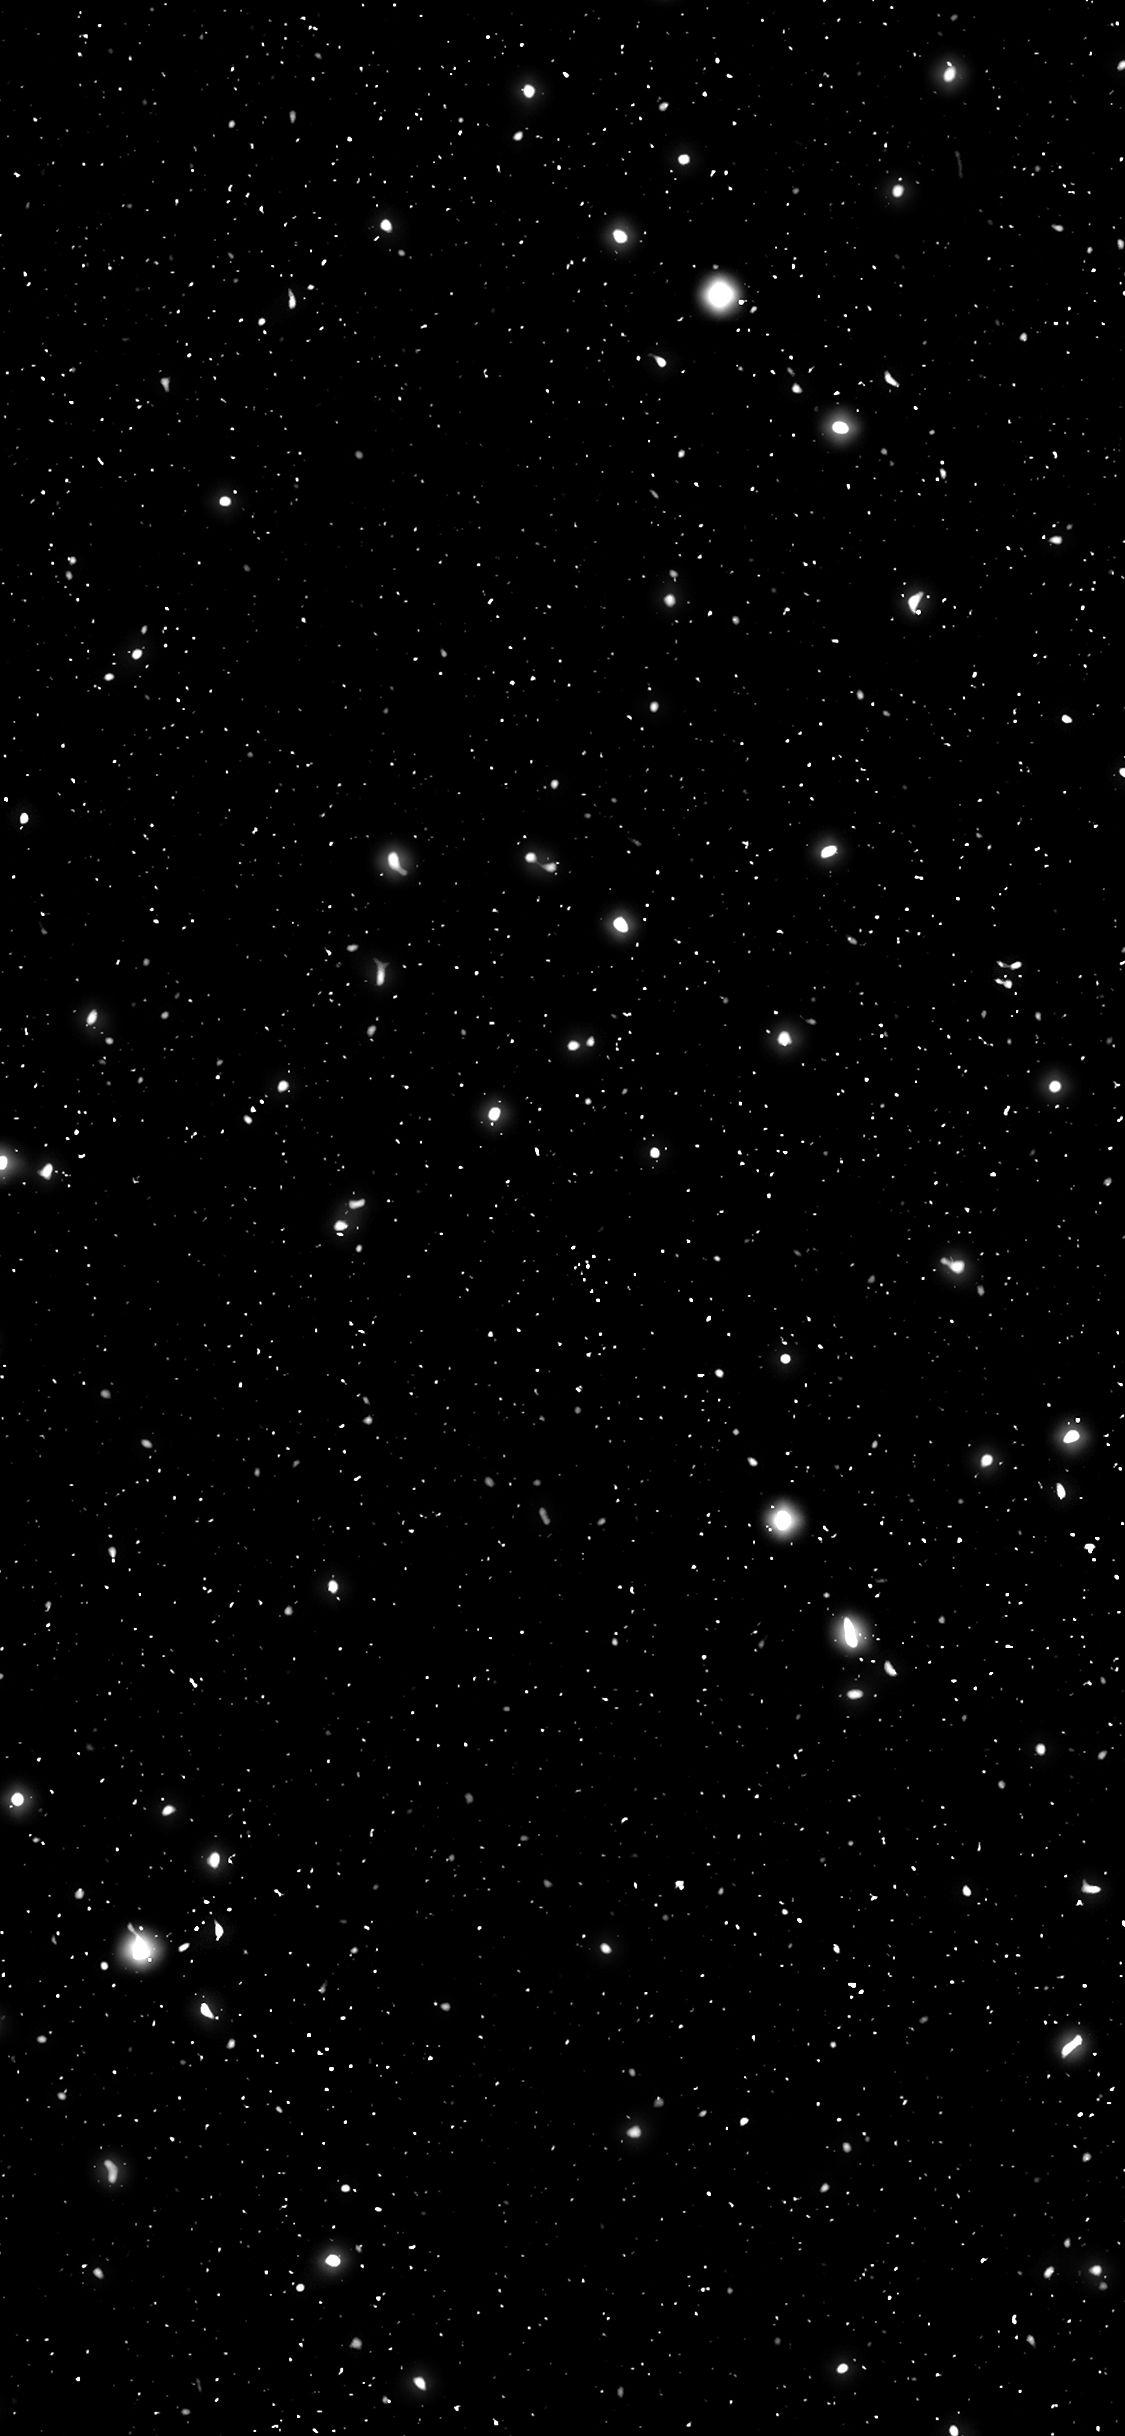 Best Galaxy Wallpaper Hd In 2020 Galaxy Wallpaper Iphone Hd Galaxy Wallpaper Galaxy Wallpaper